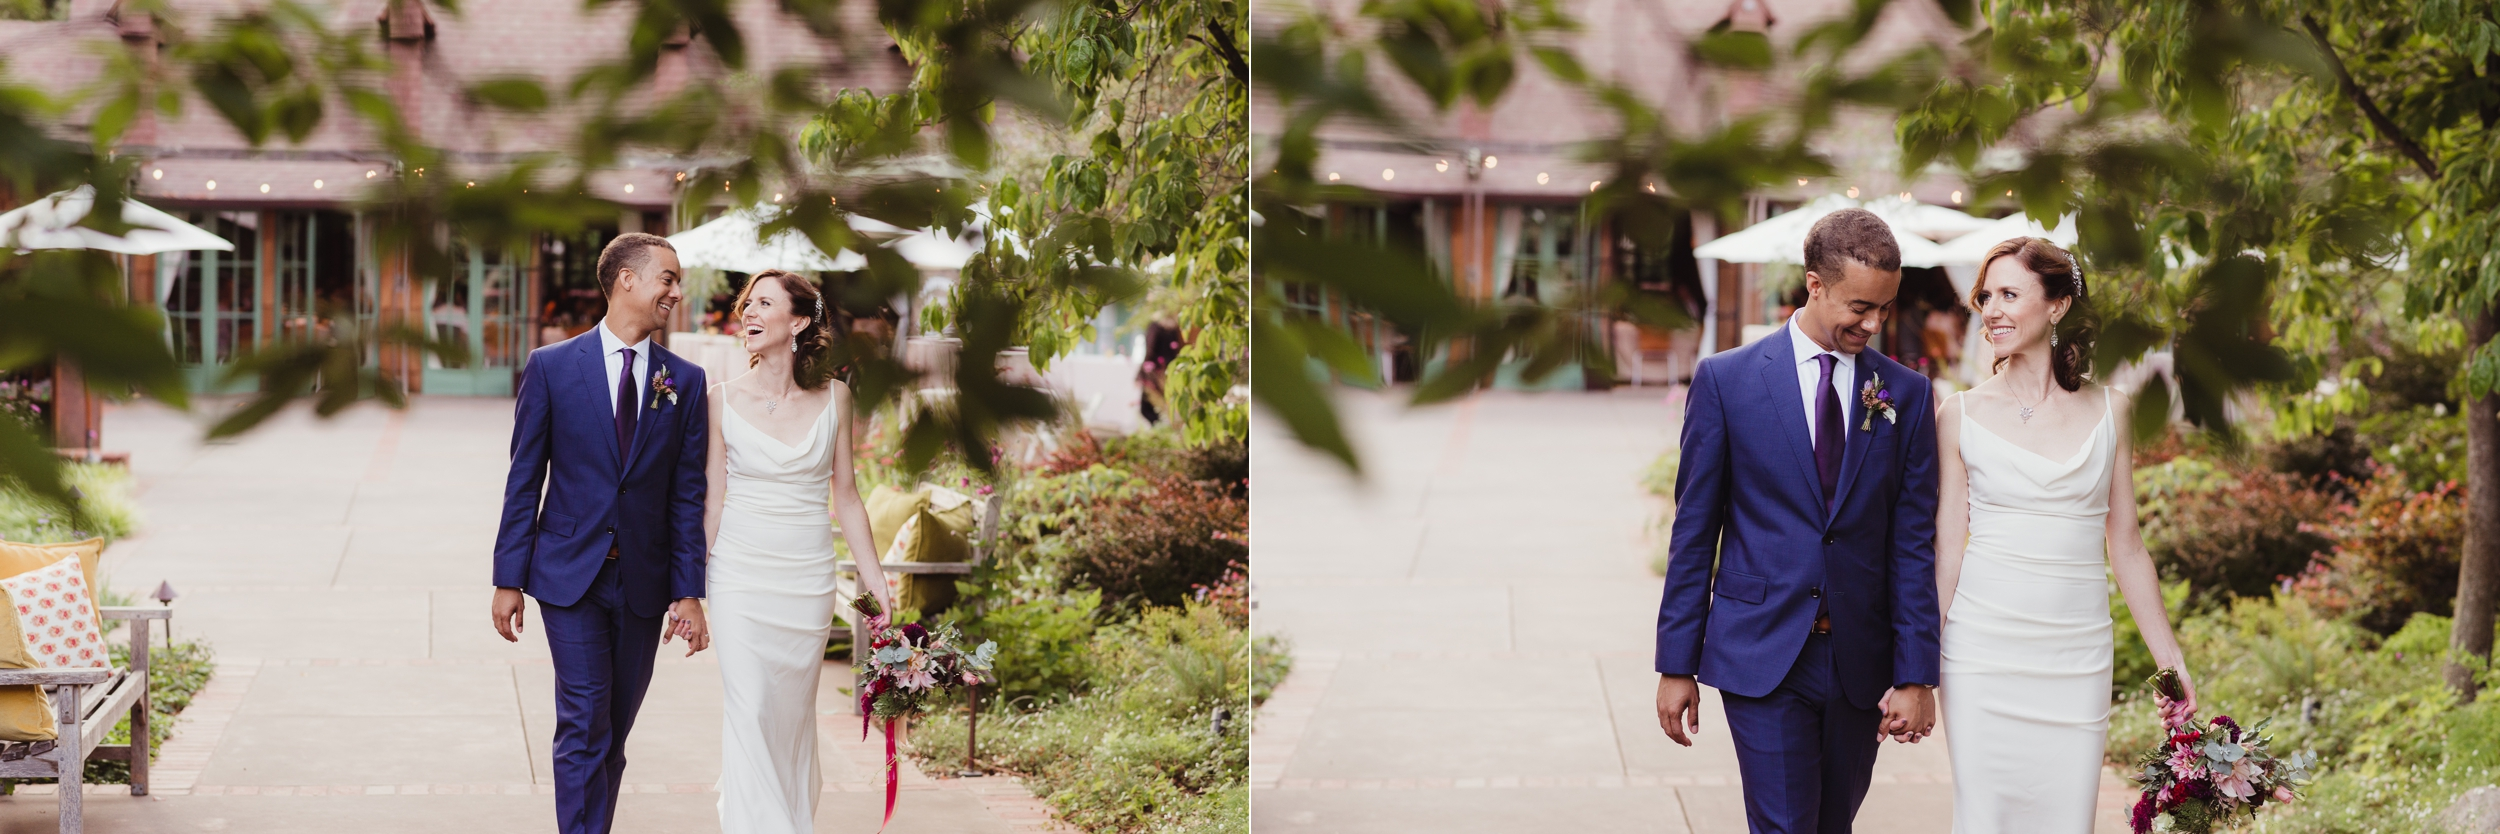 44-outdoor-art-club-wedding-vivianchen-402_WEB.jpg